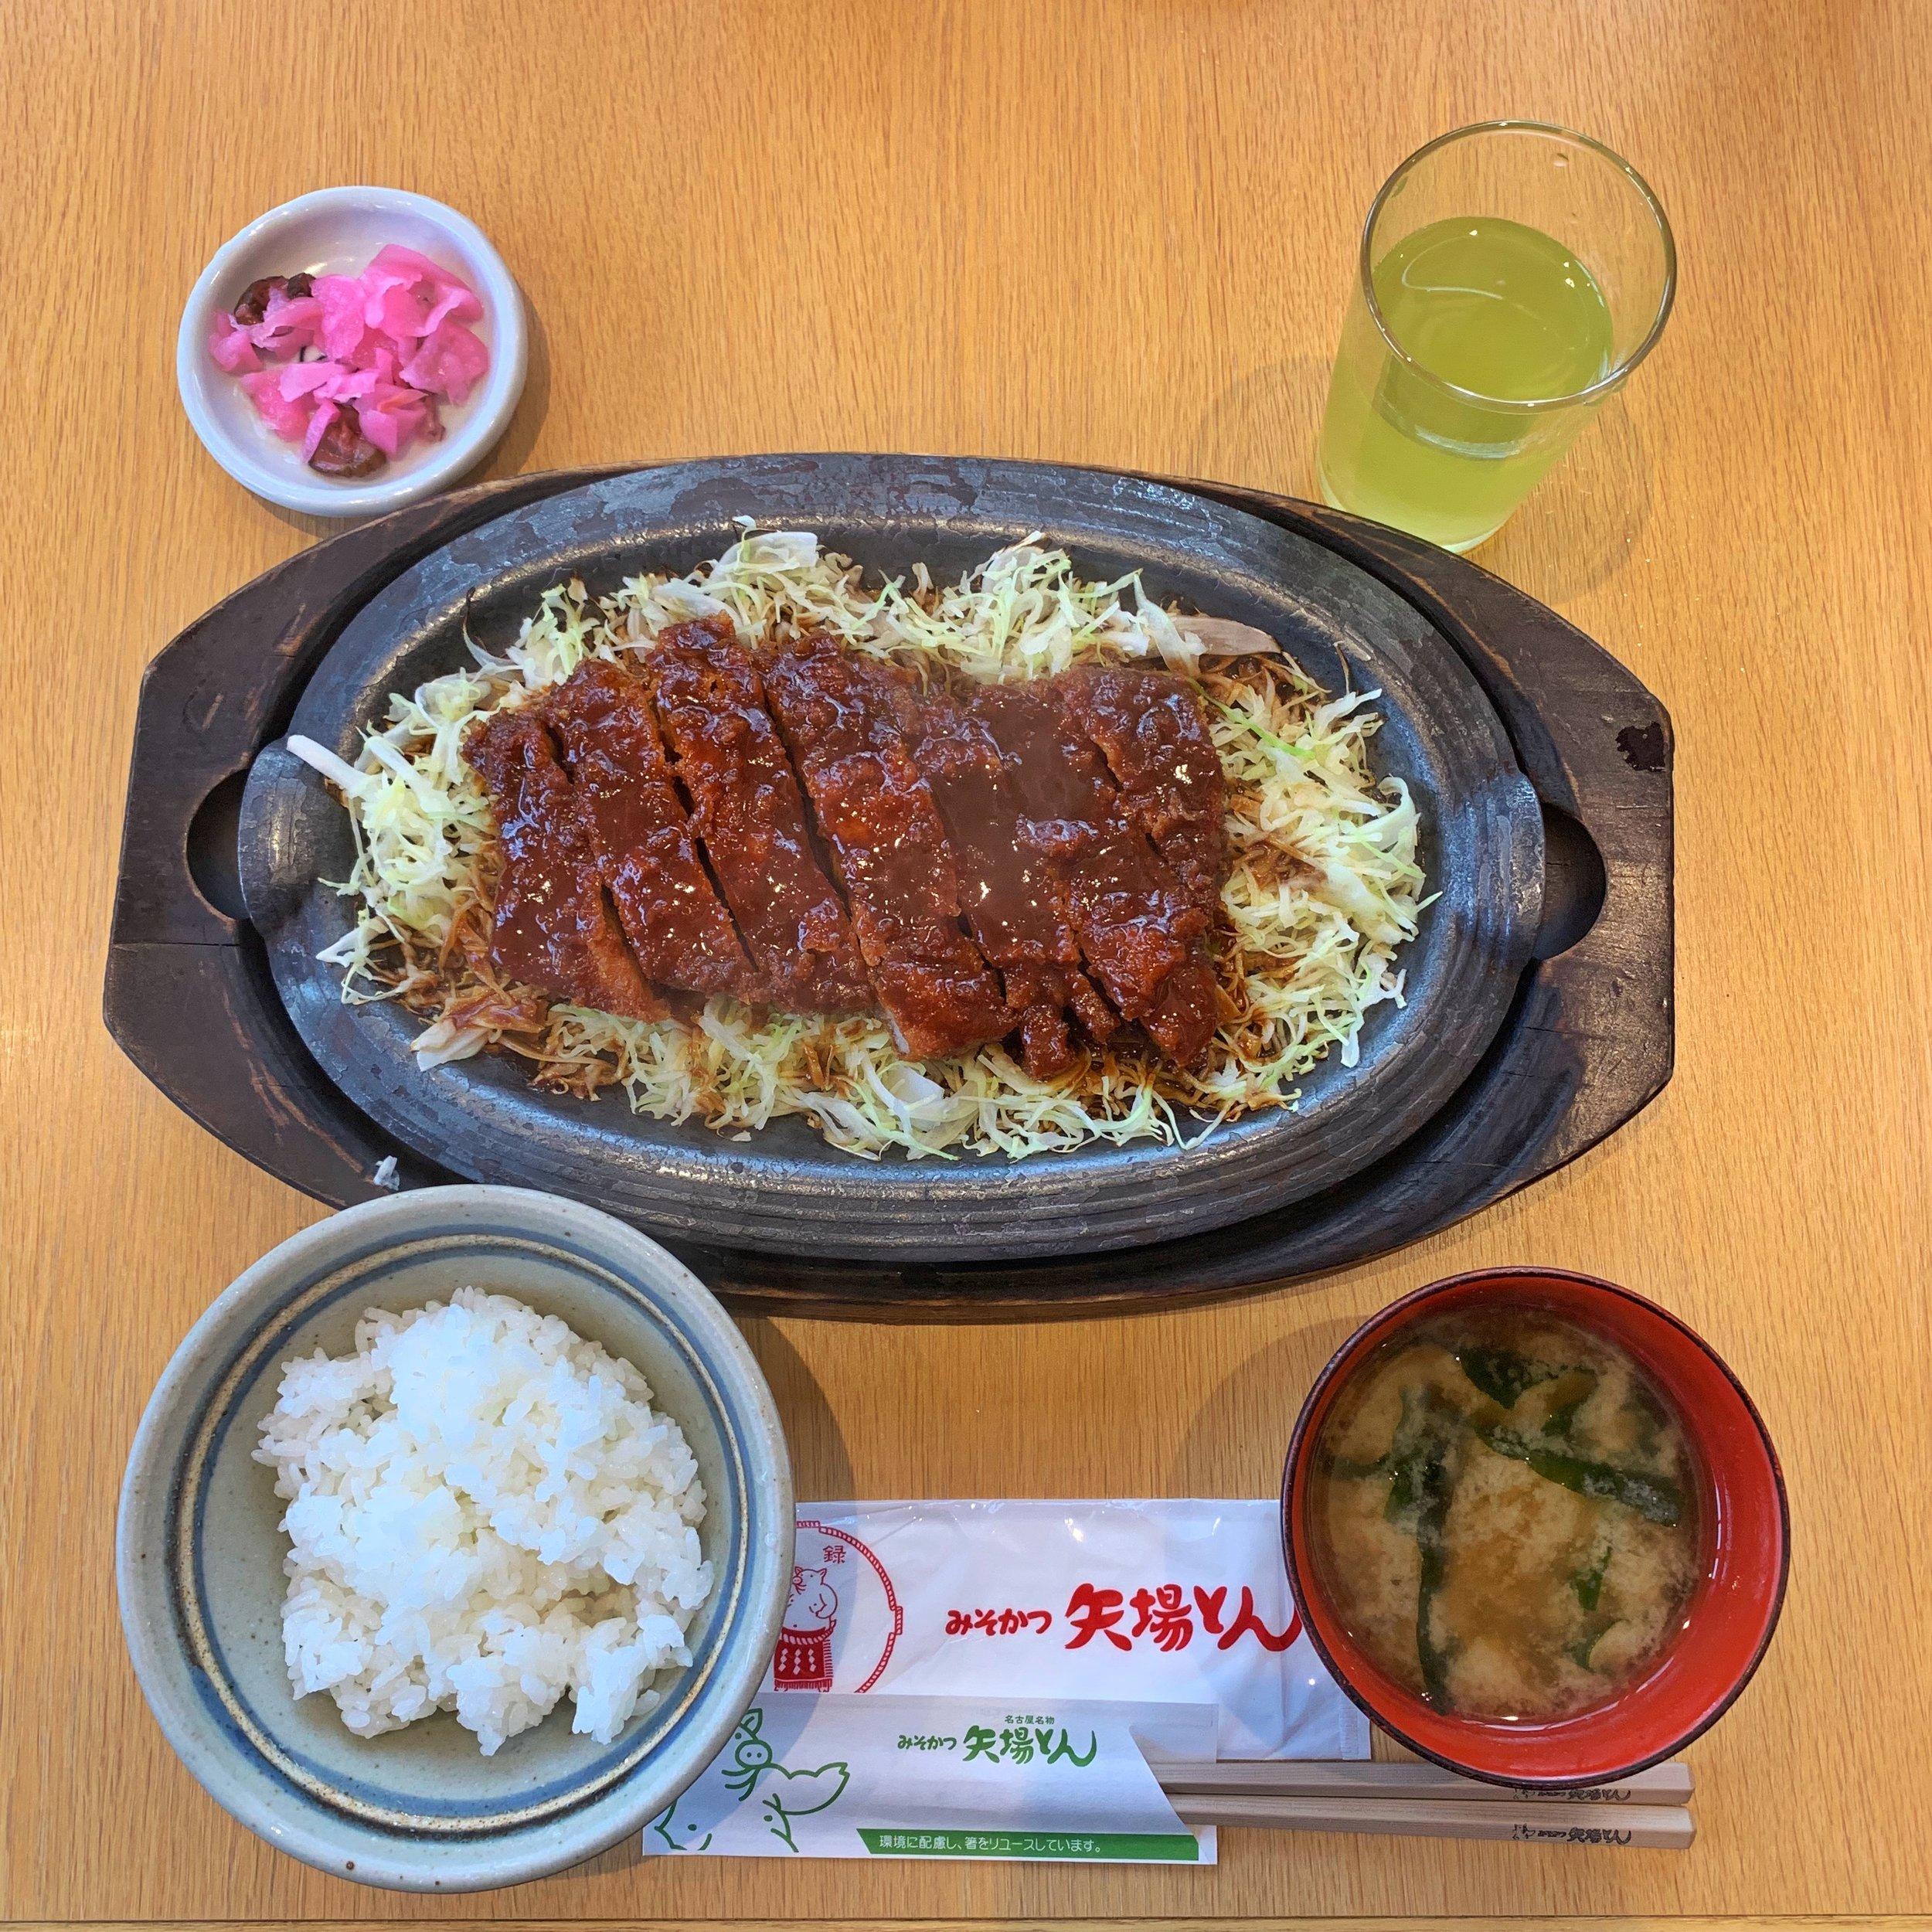 yabaton nagoya japan miso katsu